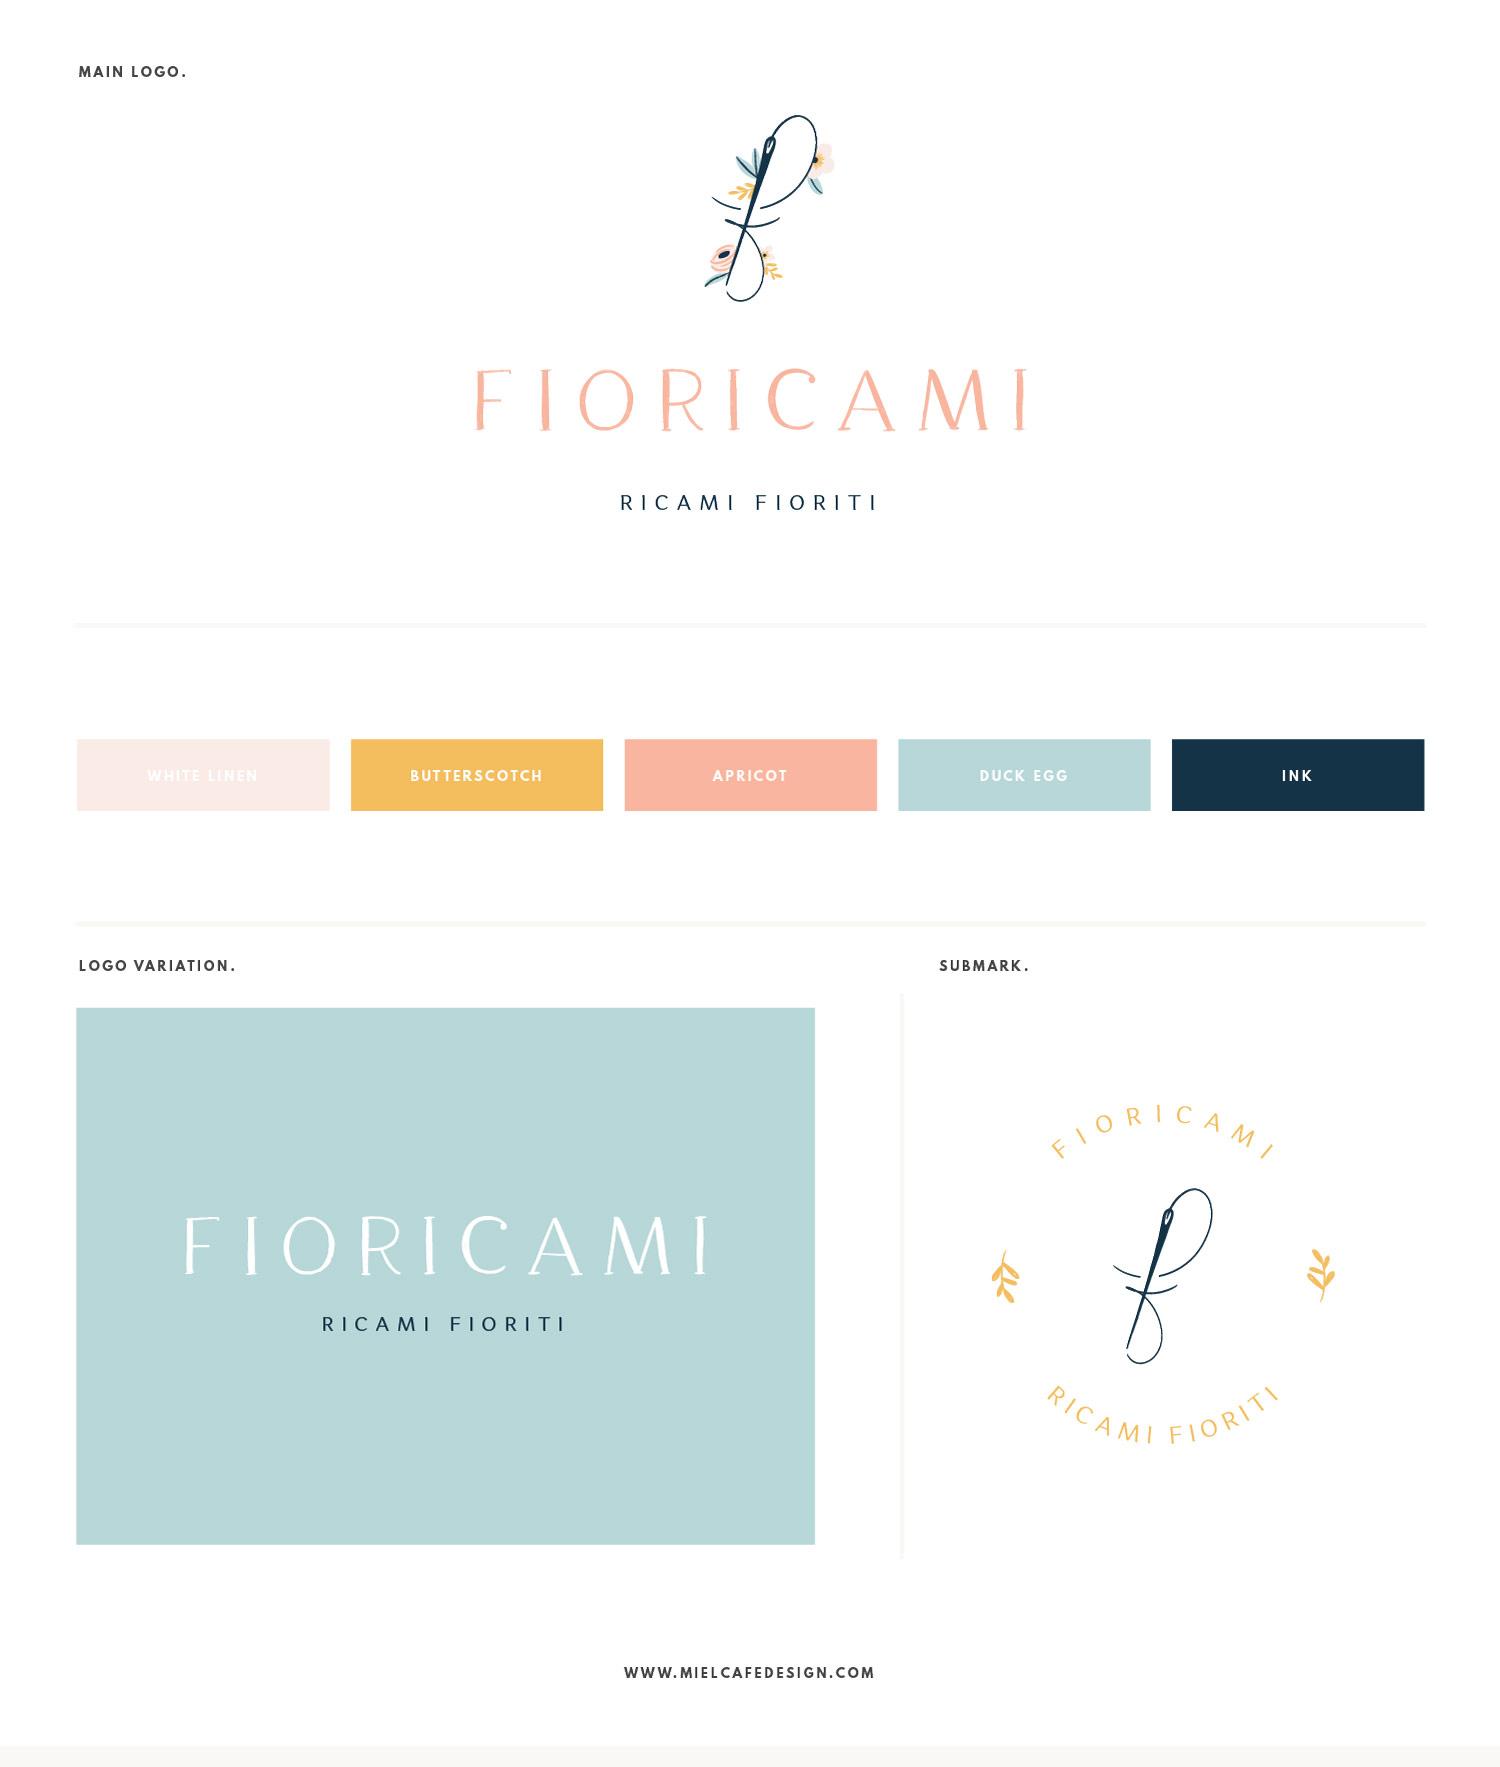 Miel Café Design Portfolio: Floral pastel brand board for Fioricami handmade embroidery brand